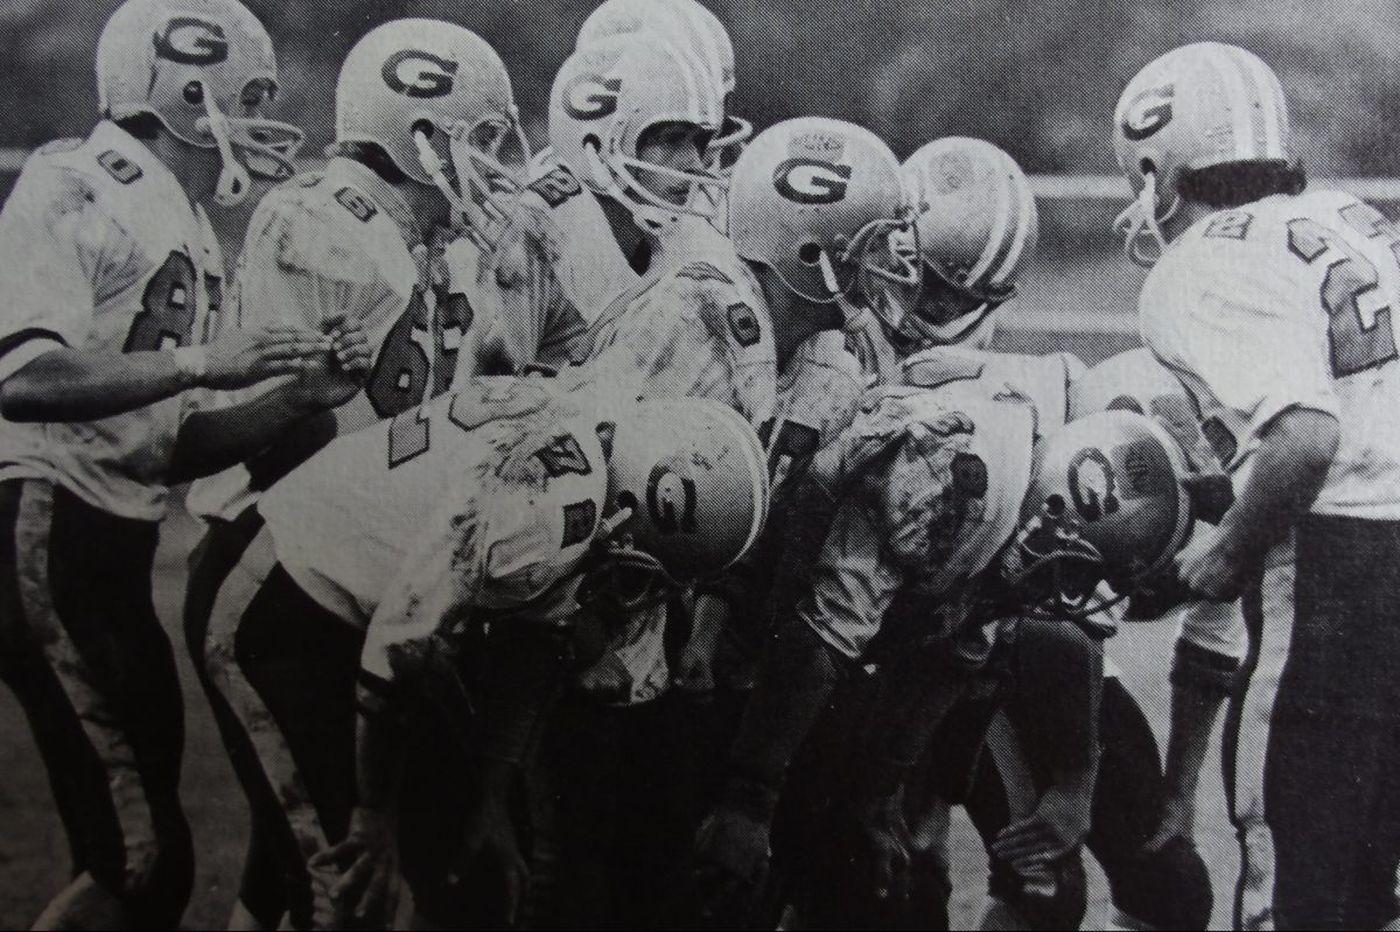 Remembering Gloucester's unbeaten football teams of 1969-70-71